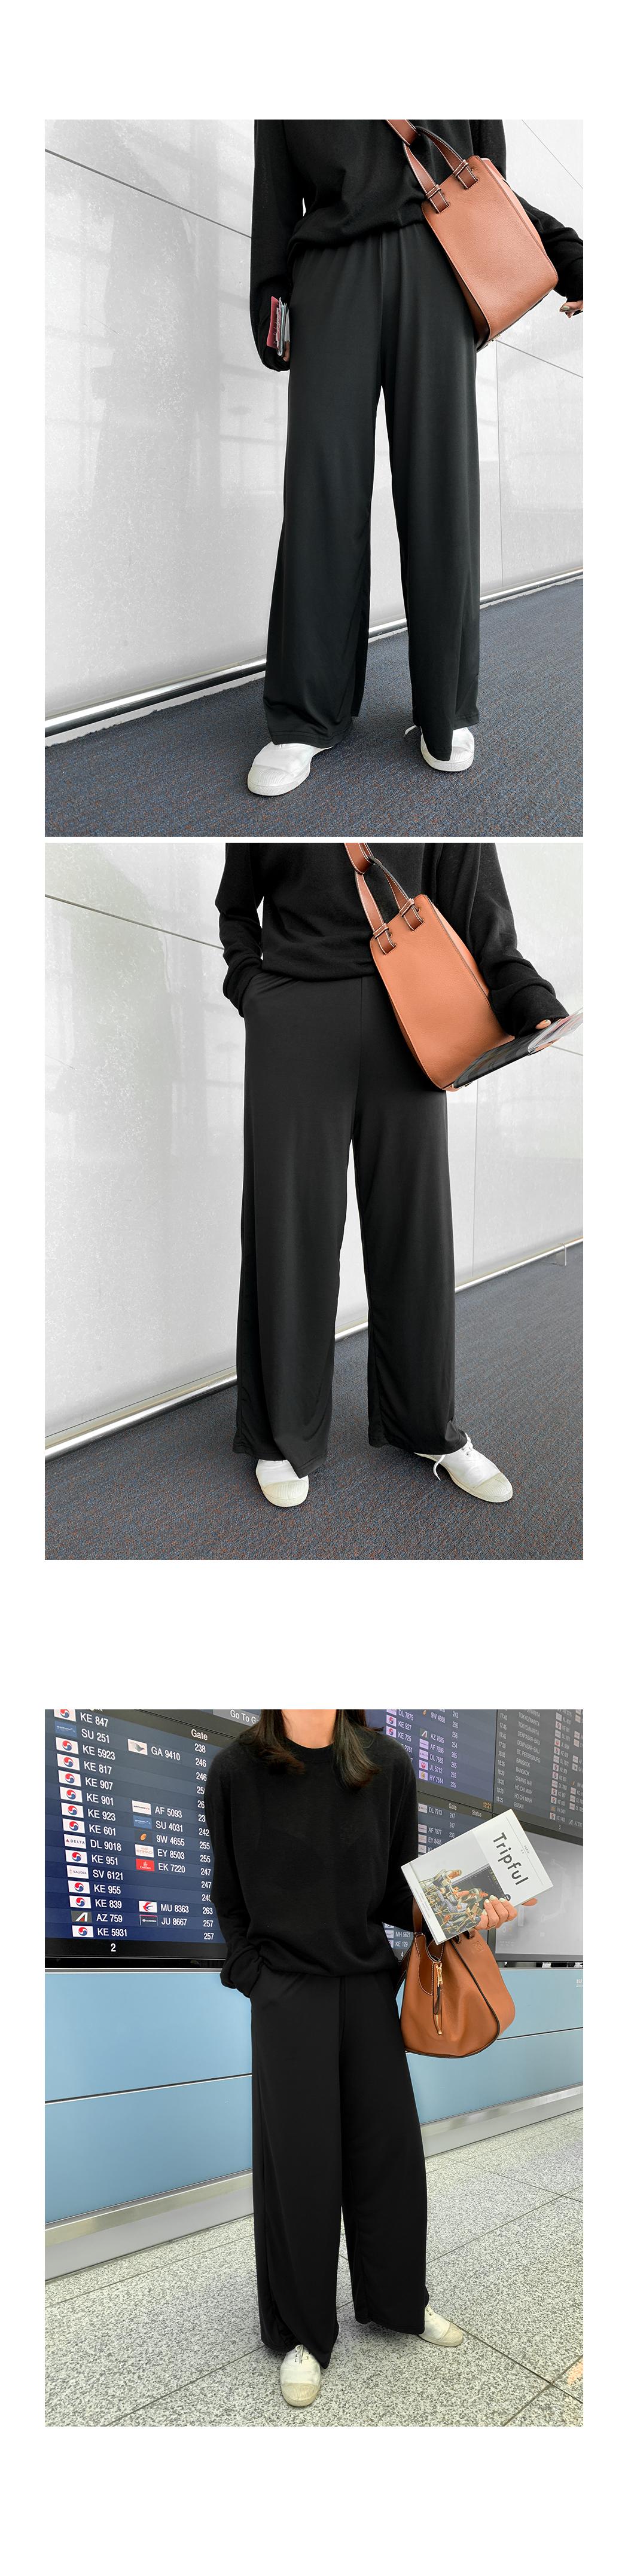 Planning Specials / PBP. Cooling Wide Bending Pants